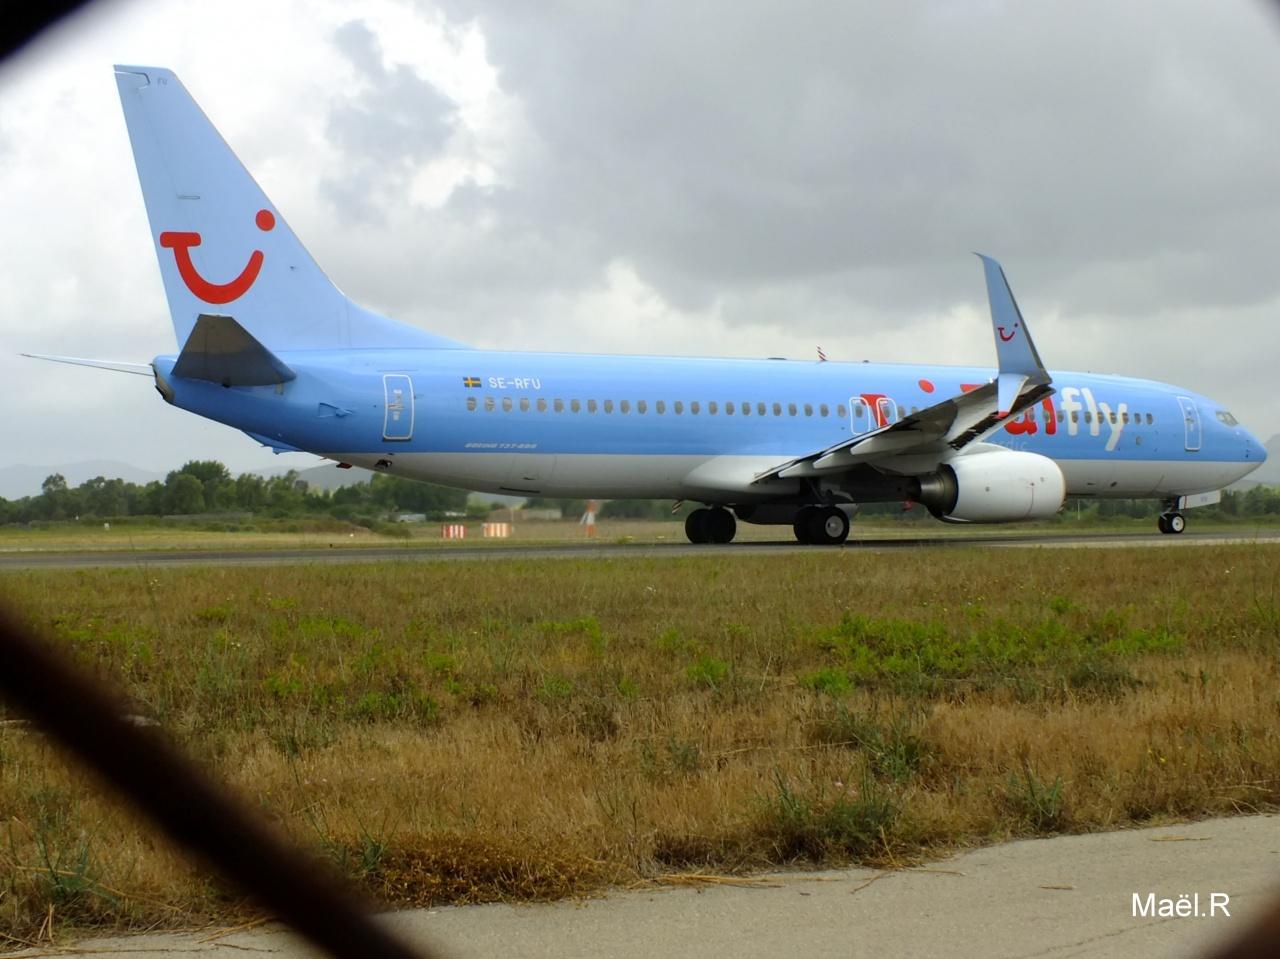 Alghero Fertilia aéroport LIEA/ALG 2014 537119Sardaignen7004